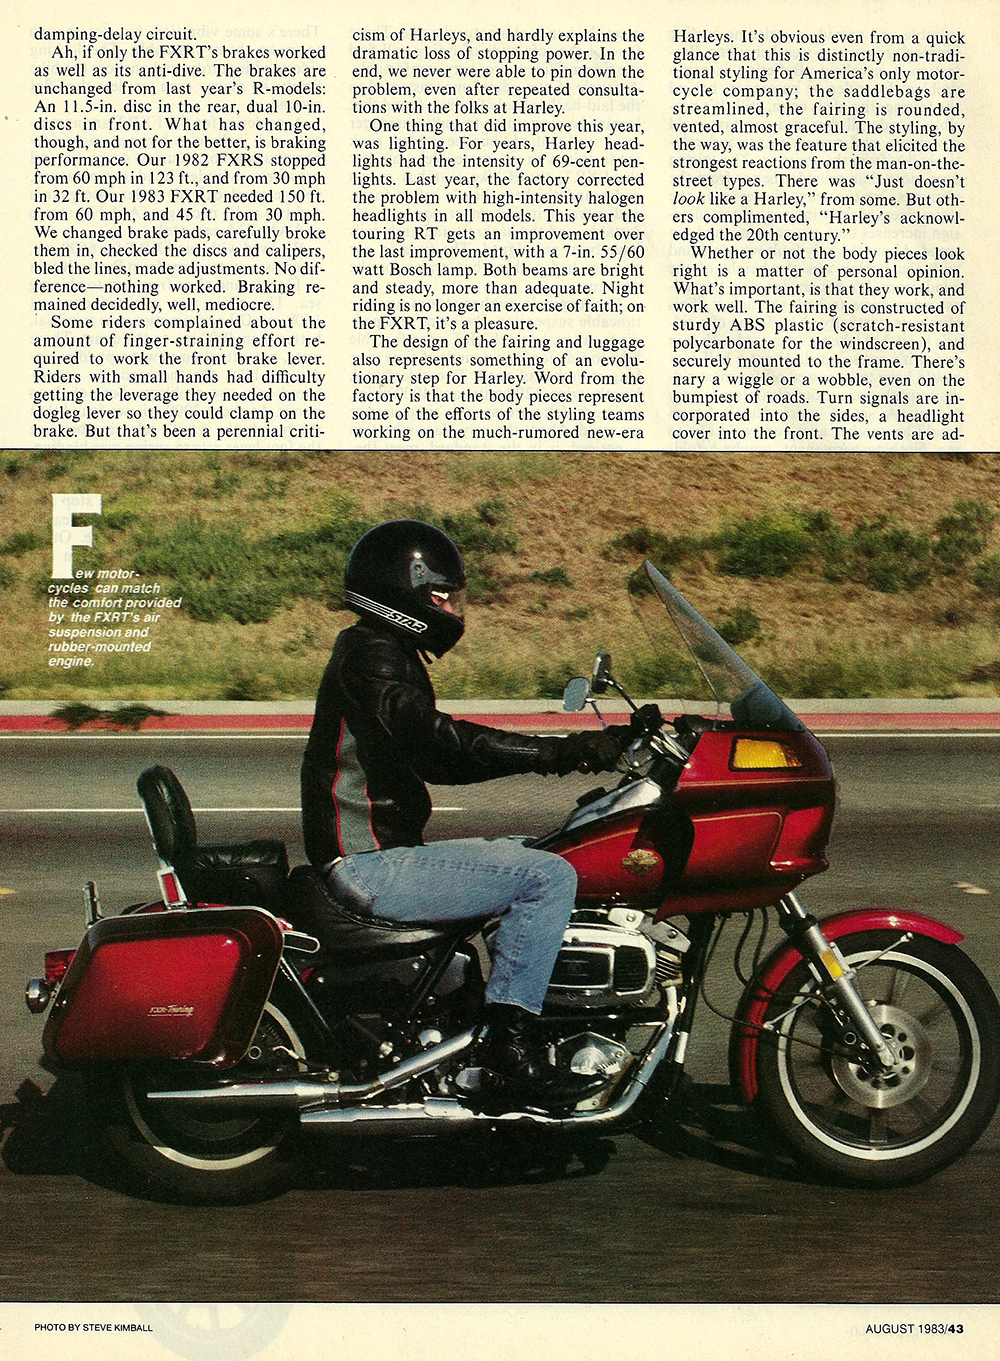 1983 Harley-Davidson FXRT road test 04.jpg